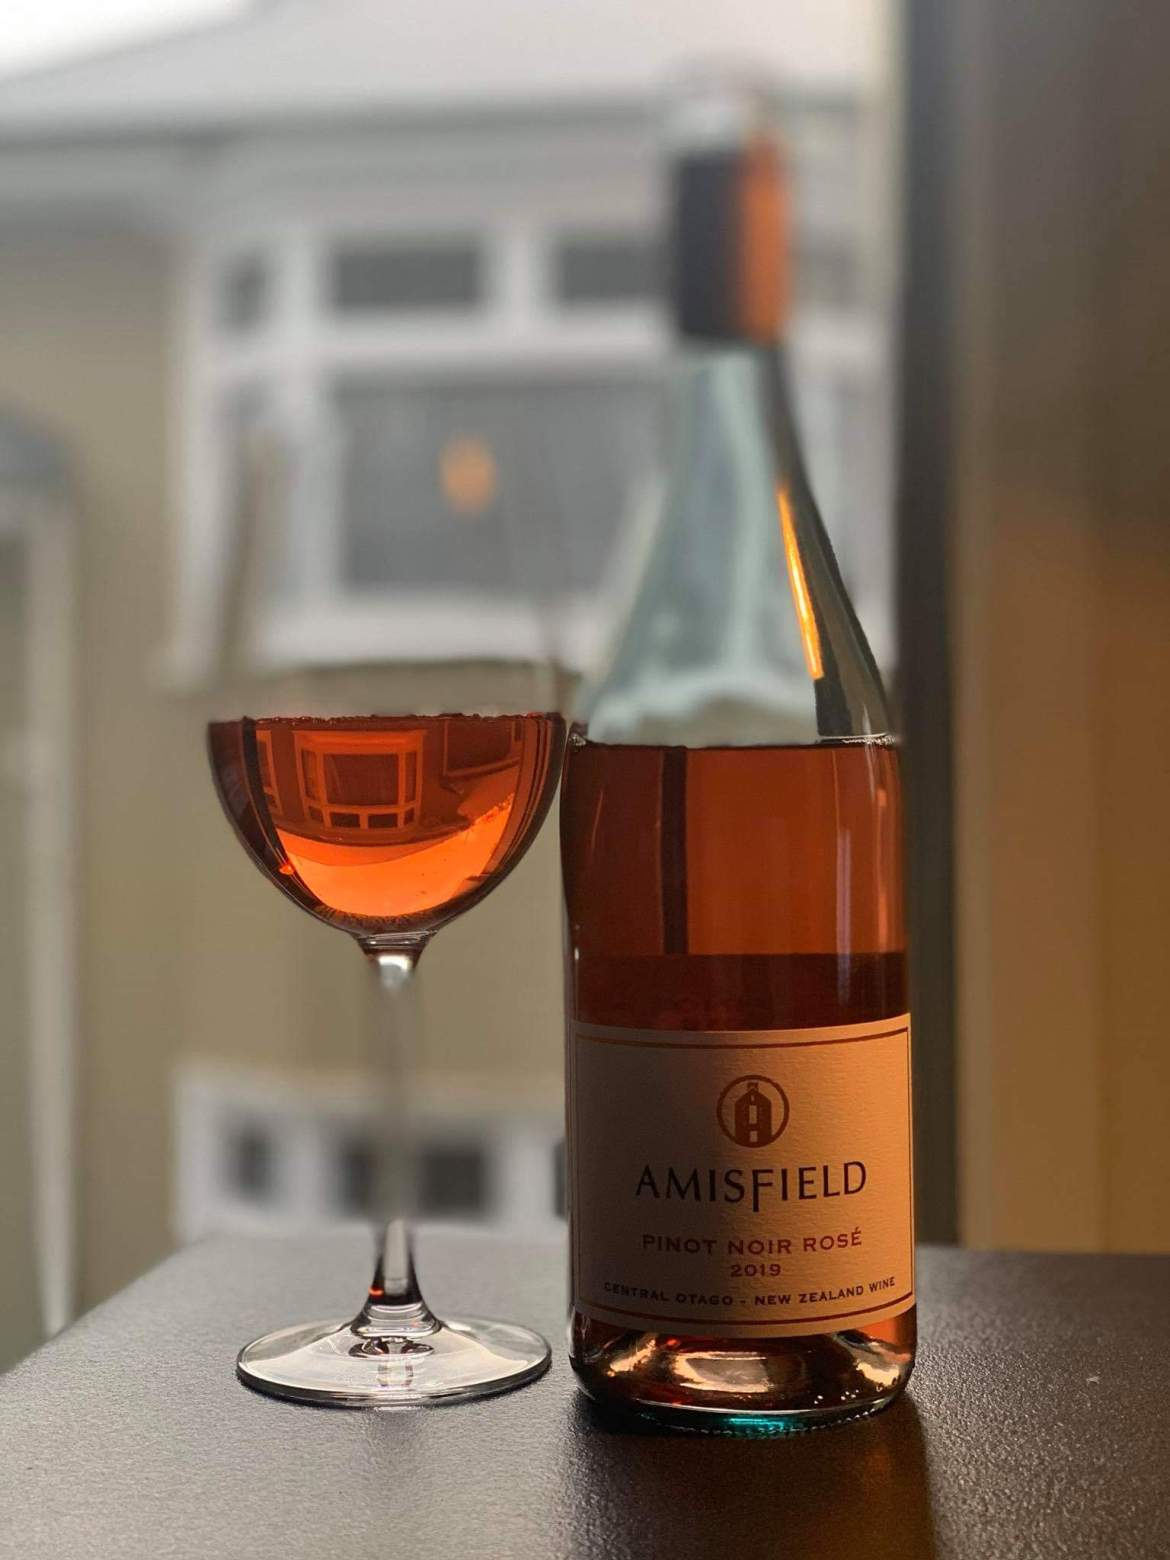 Amisfield Pinot Noir Rosé 2019 (3.5/5 ?⭐)